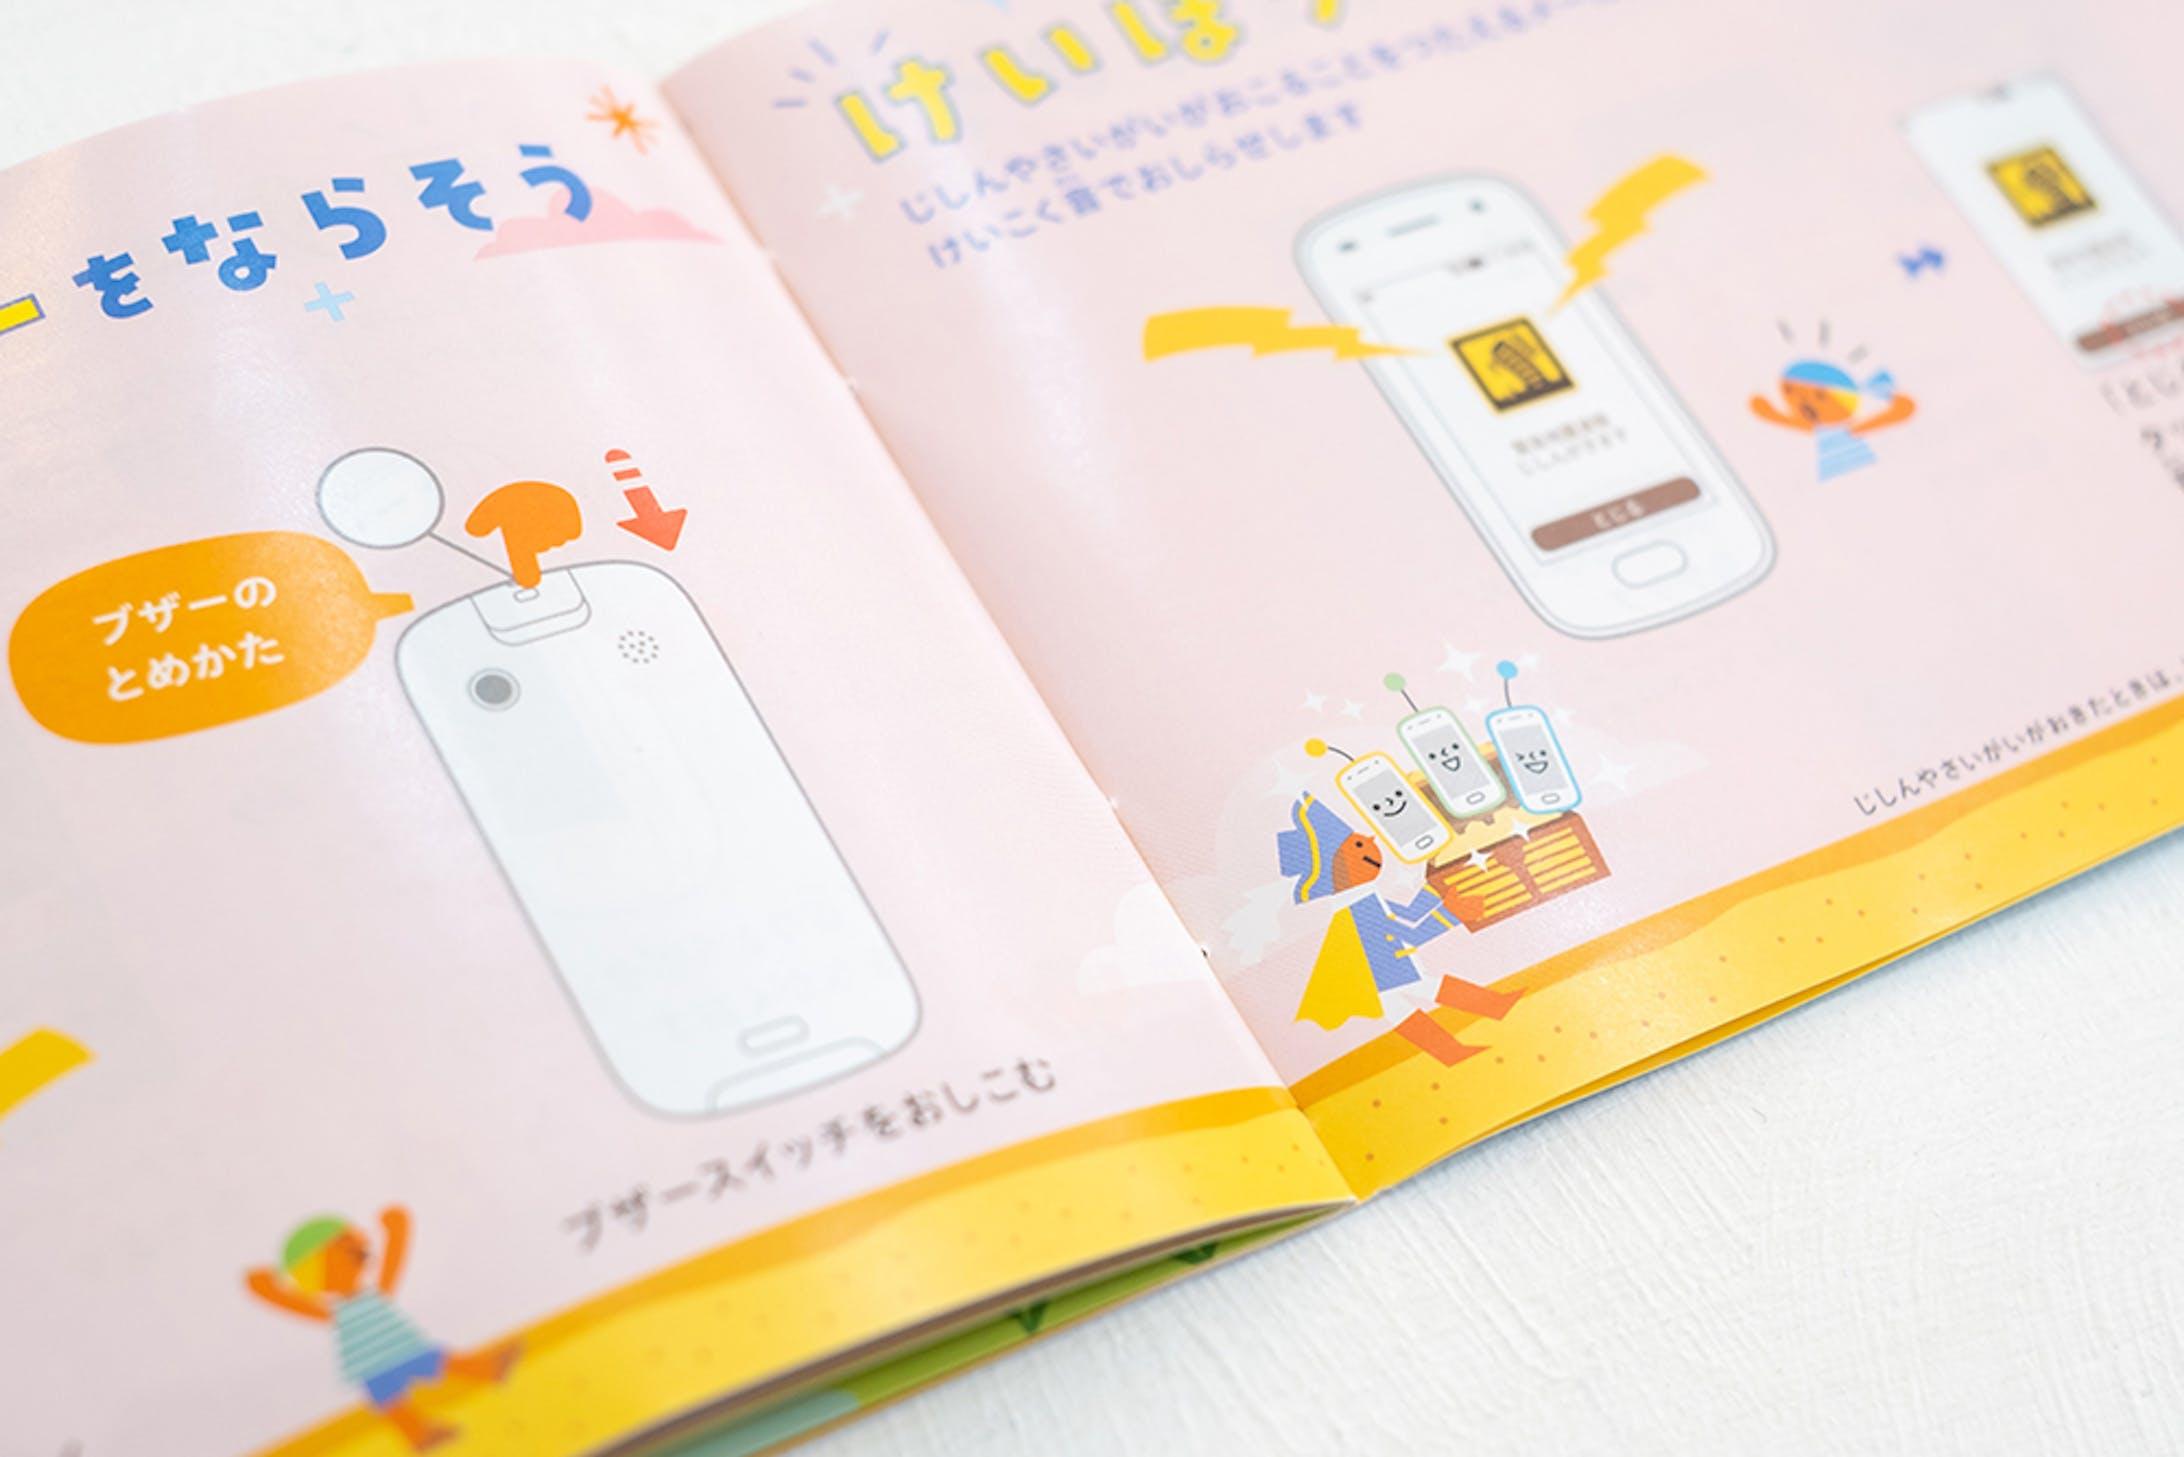 SoftBank キッズフォン2-7